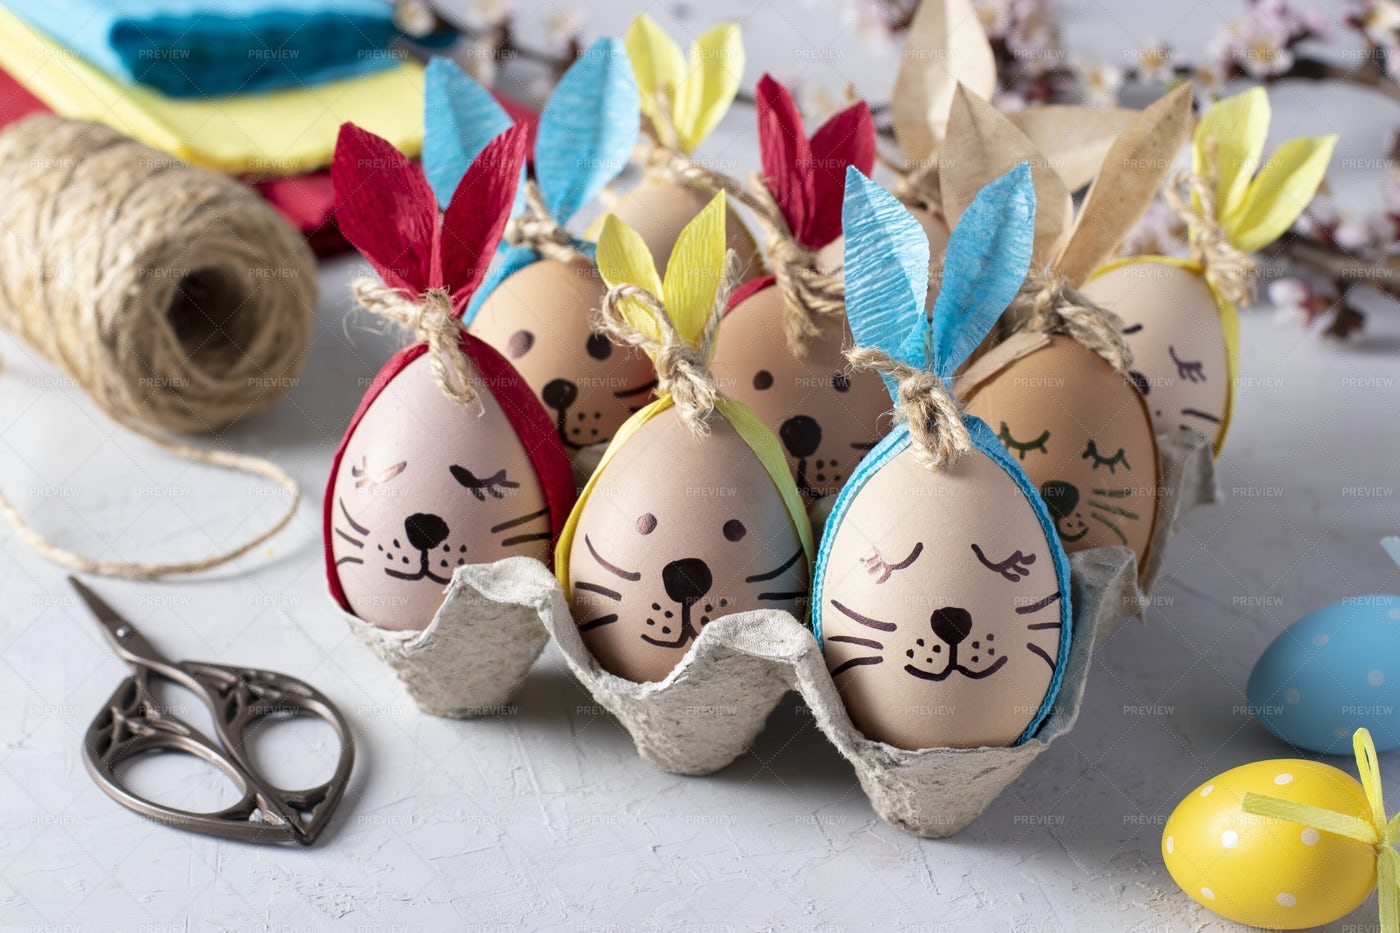 Easter Bunnies Made Of Eggs: Stock Photos